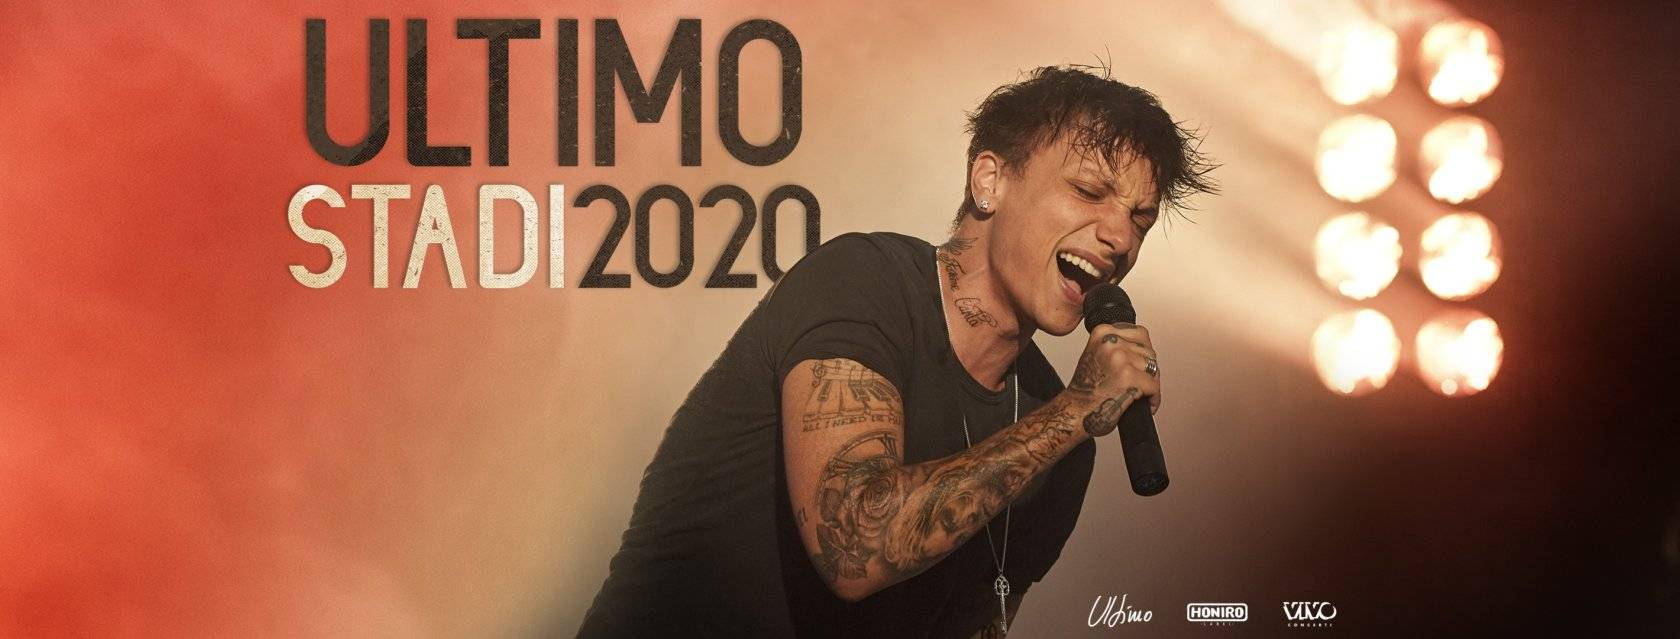 ultimo stadi 2020